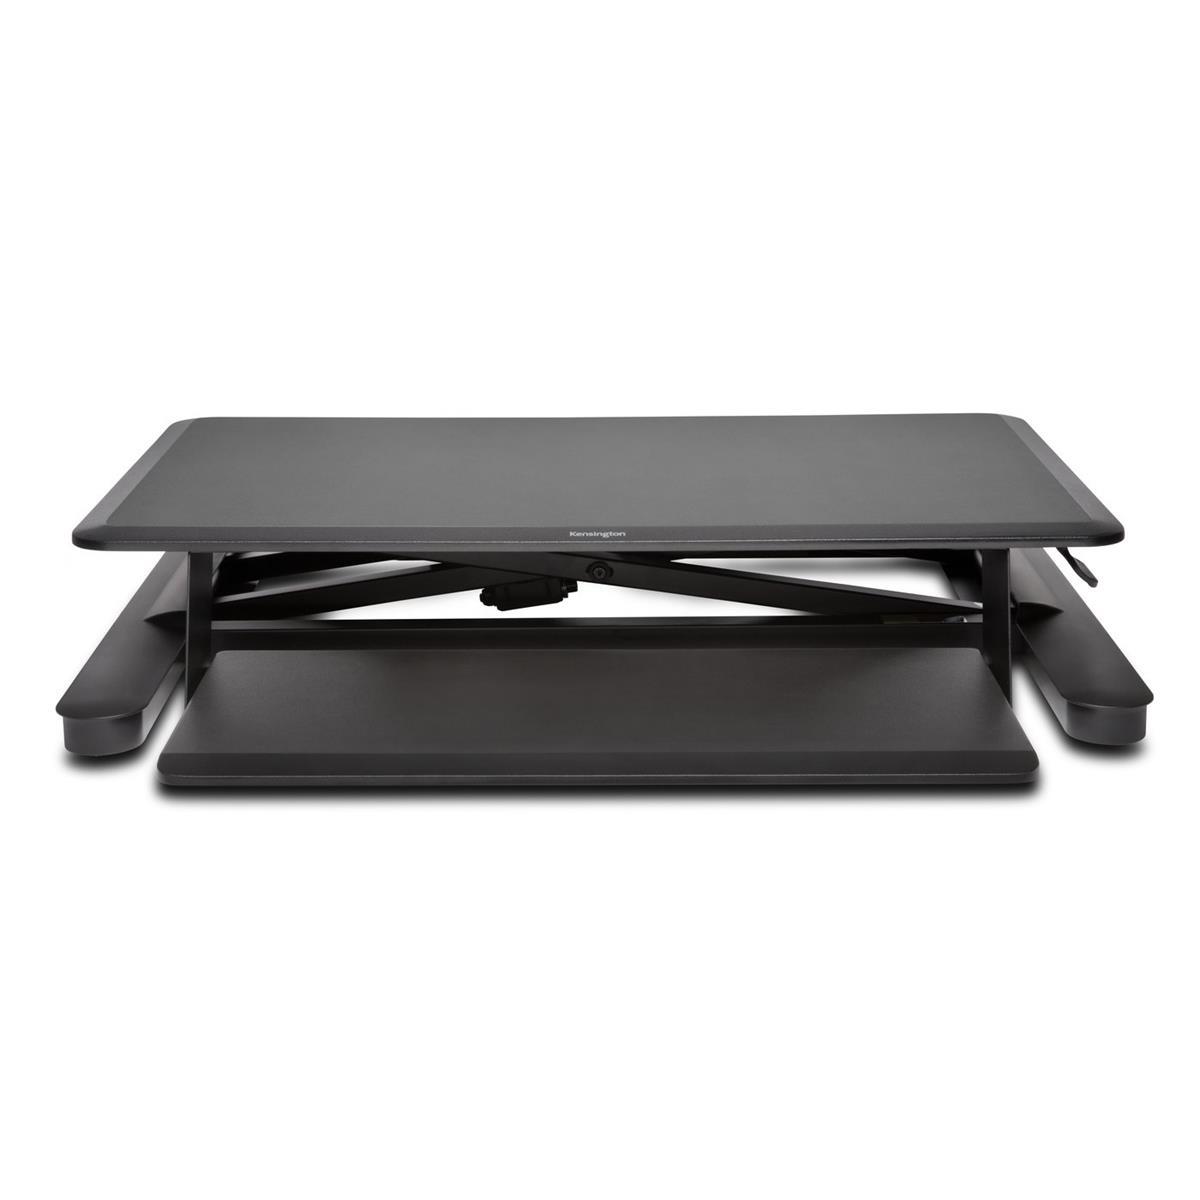 Kensington SmartFit Sit Stand Desk Ref K52804WW